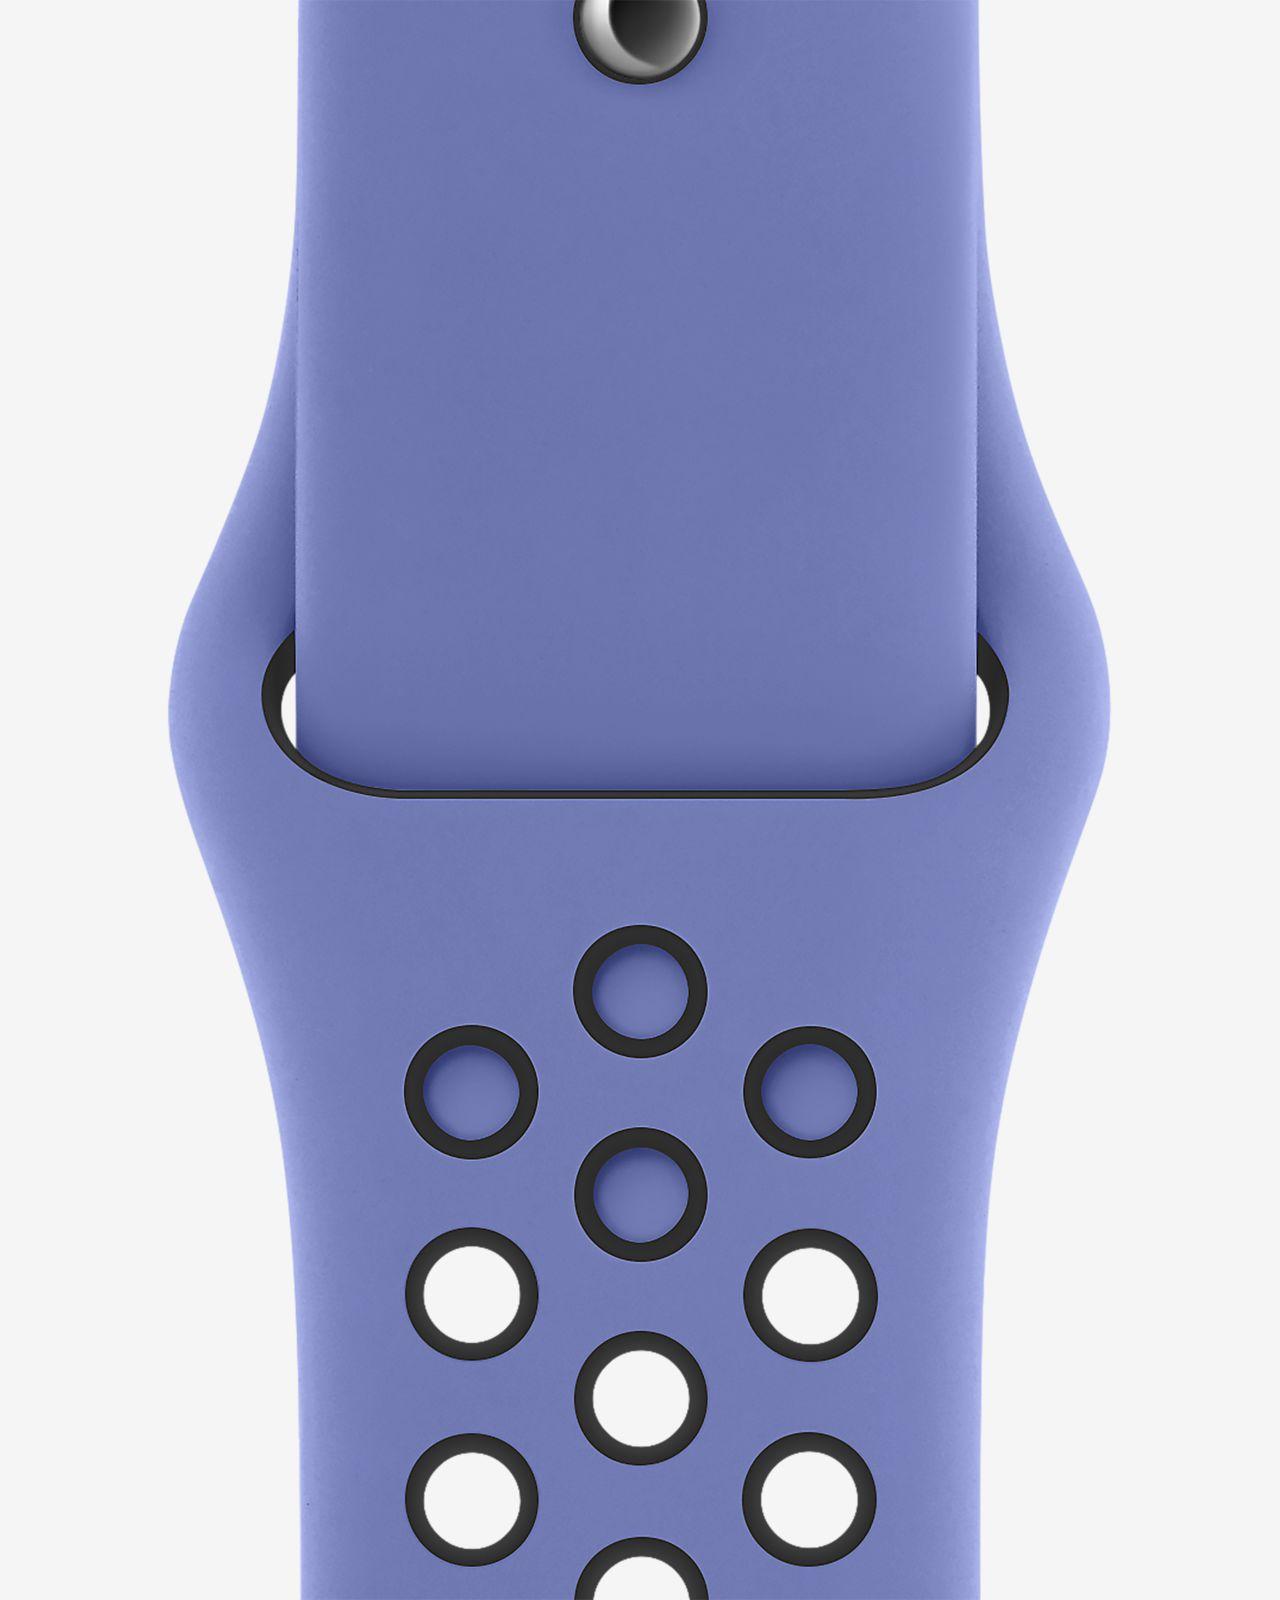 Apple Watch Nike 44-mm-Sport Band in Royal Pulse/Black